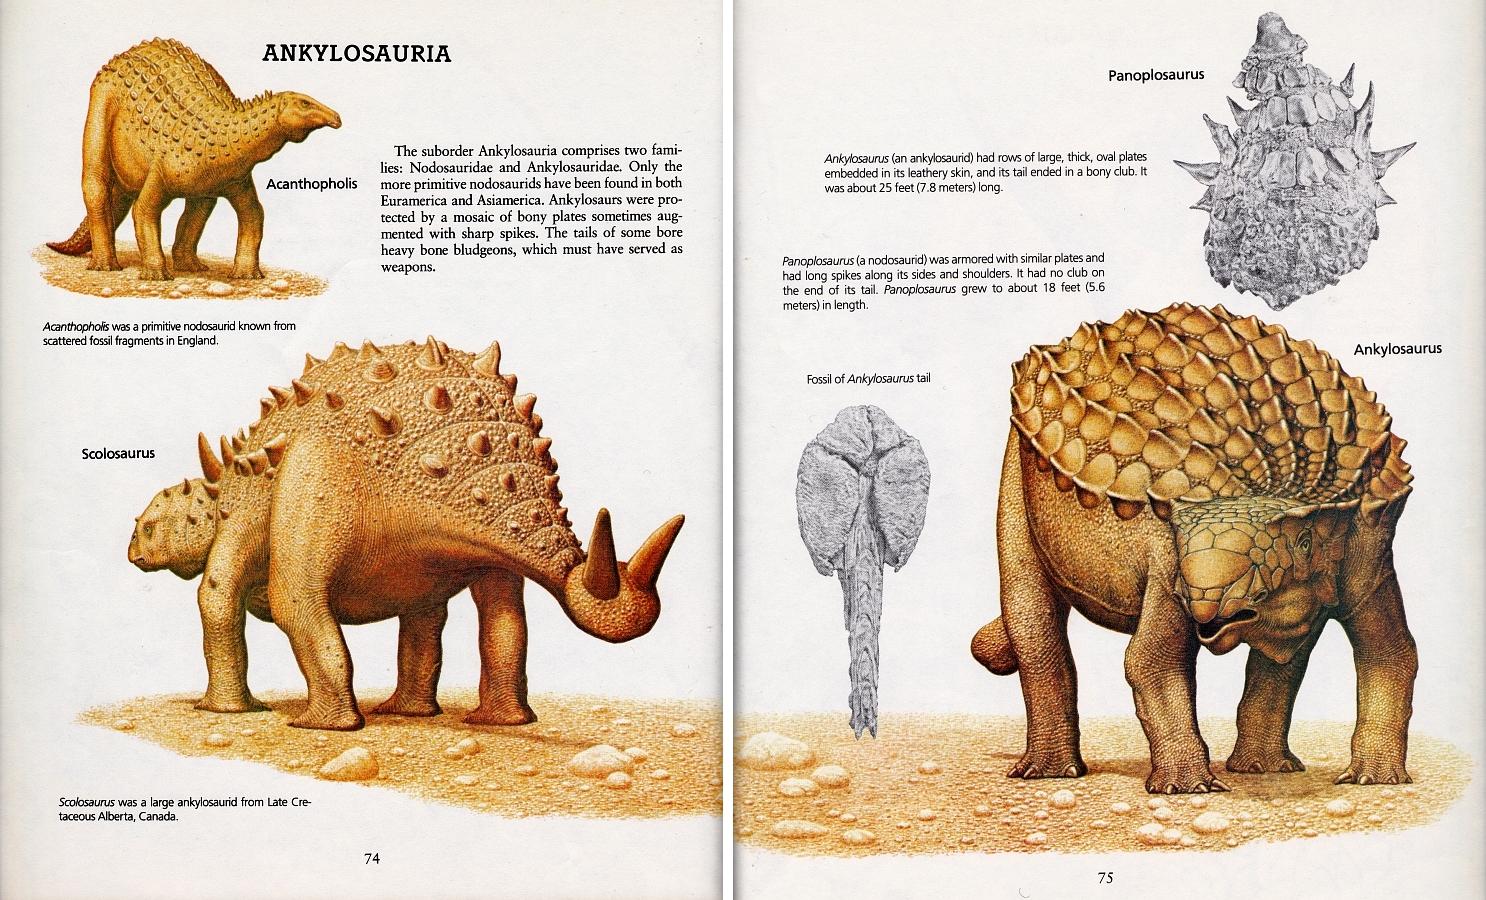 Acanthopolis, Scolosaurus, Ankylosaurus by Peter Zallinger